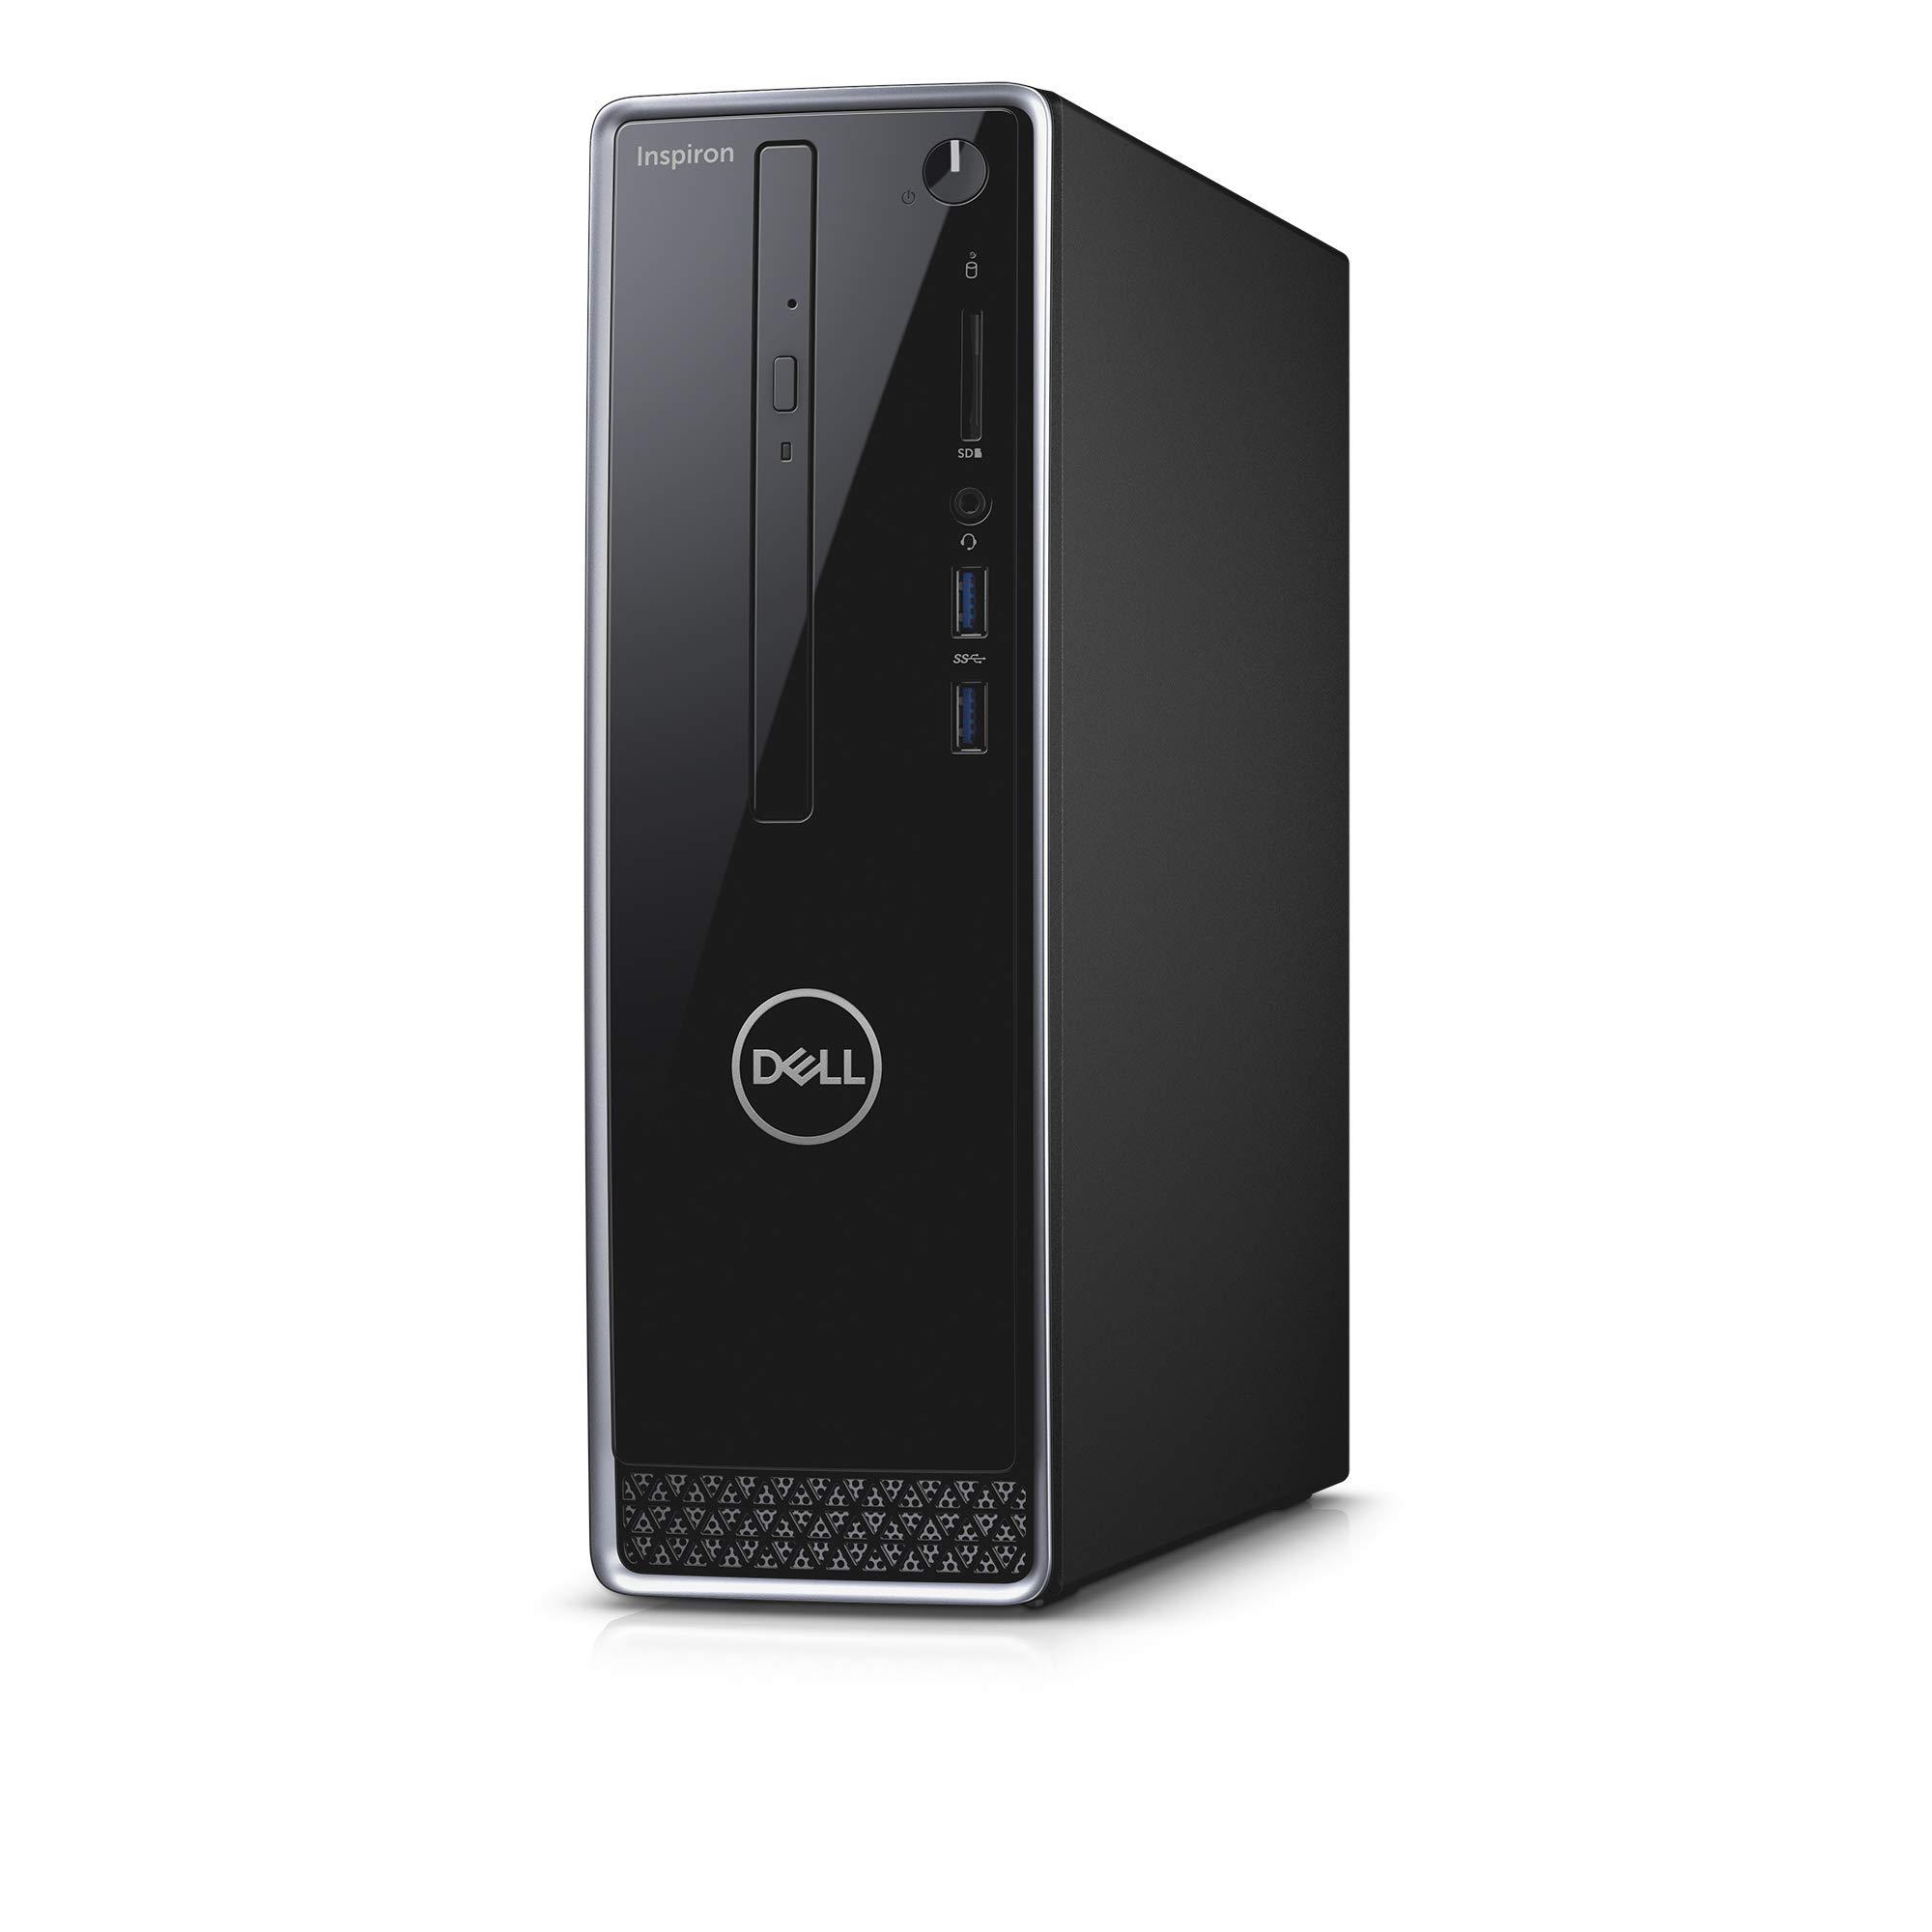 dell-inspiron-3470-desktop-2-year-onsite-service-after-remote-diagnosis-9th-gen-intel-core-i5-9400-6-core-41ghz-proc-wintel-turbo-boost-12gb-ddr4-ram-1tb-hdd128gb-ssd-dvd-rw-windows